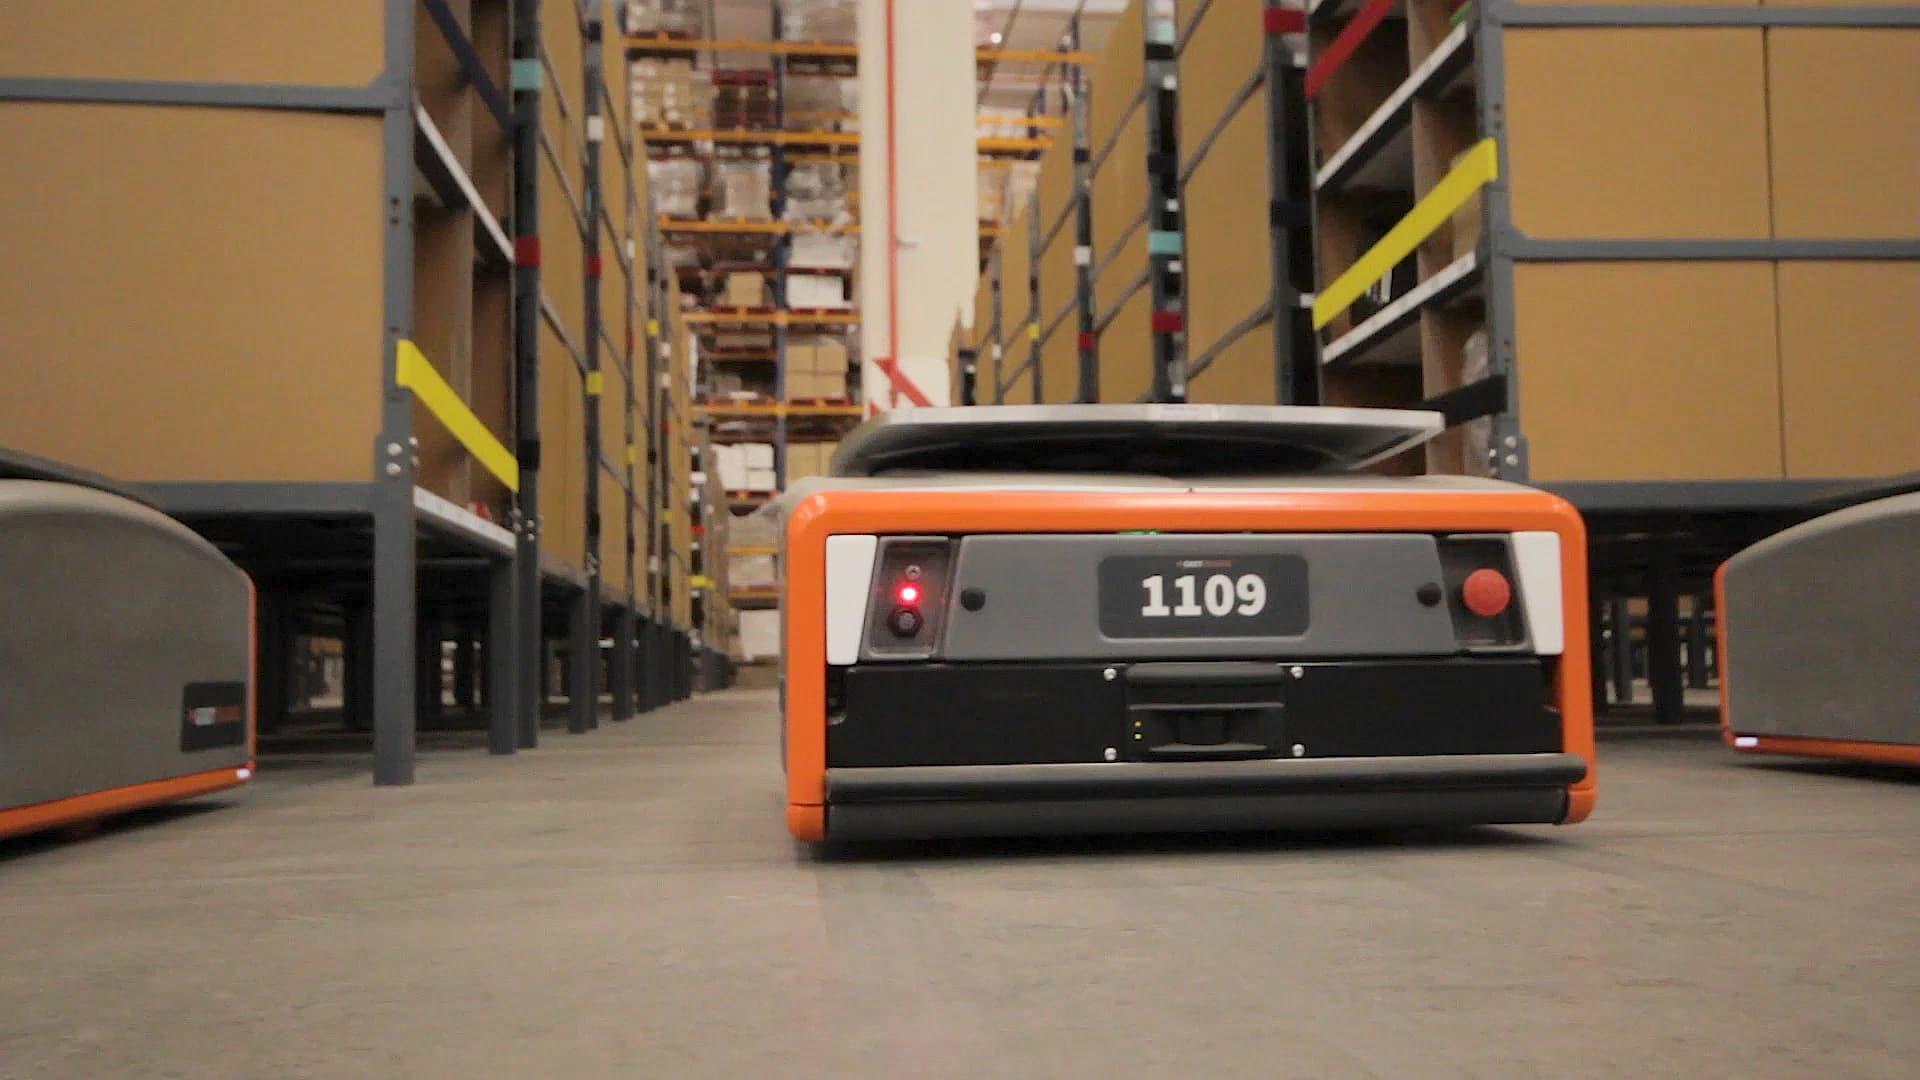 GreyOrange raises $140 million for retail warehouse robots